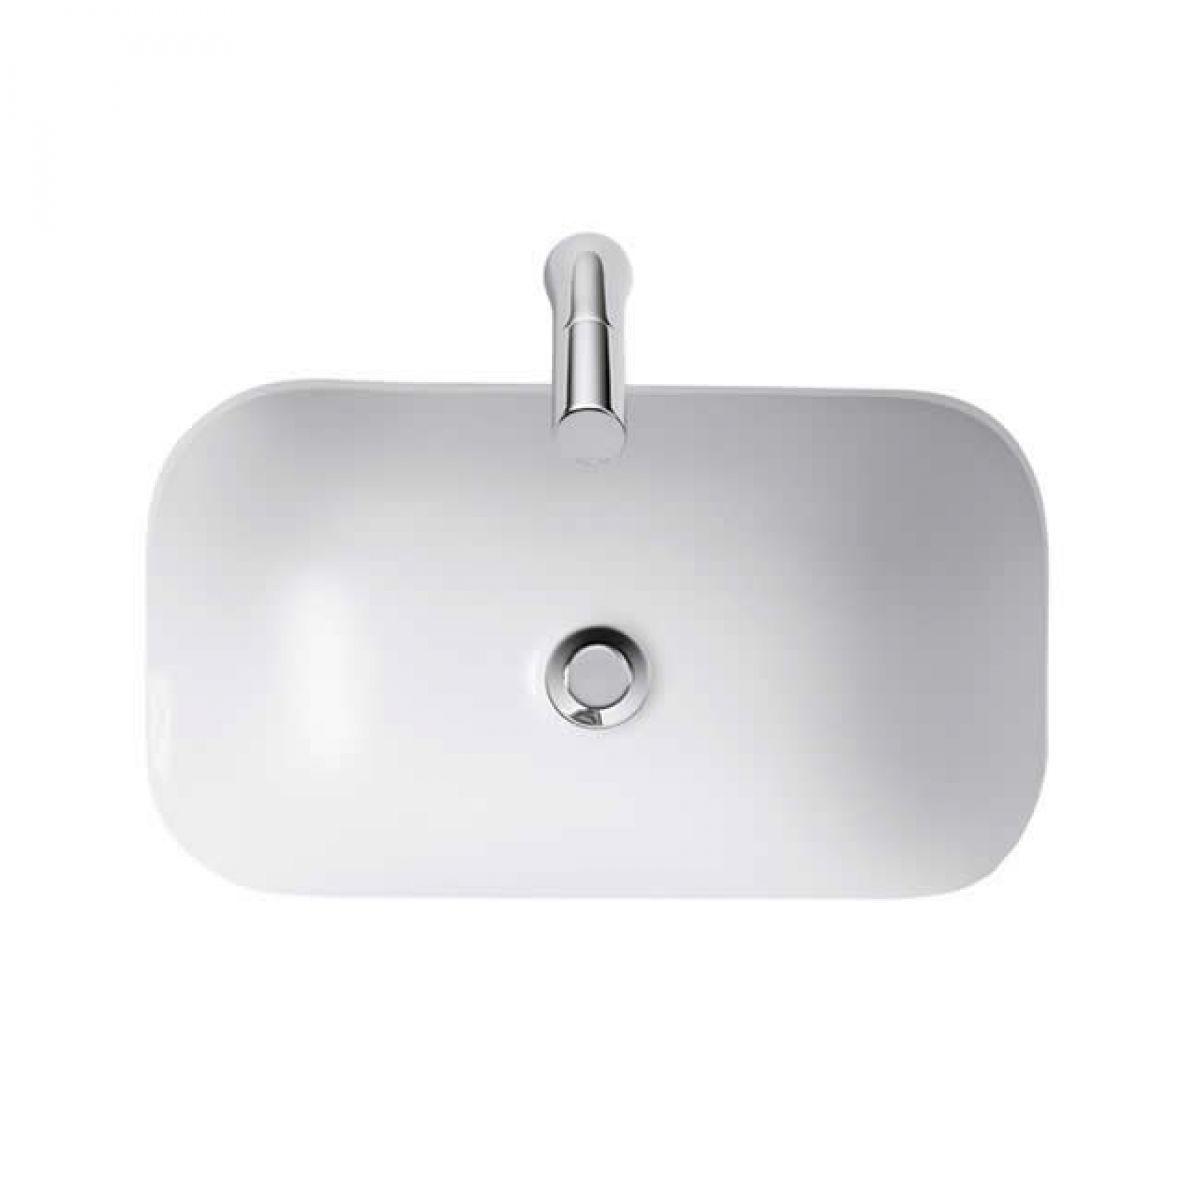 armitage shanks contour 21 under countertop basin armitage shanks contour 21 under countertop basin   bathroom      rh   pinterest com